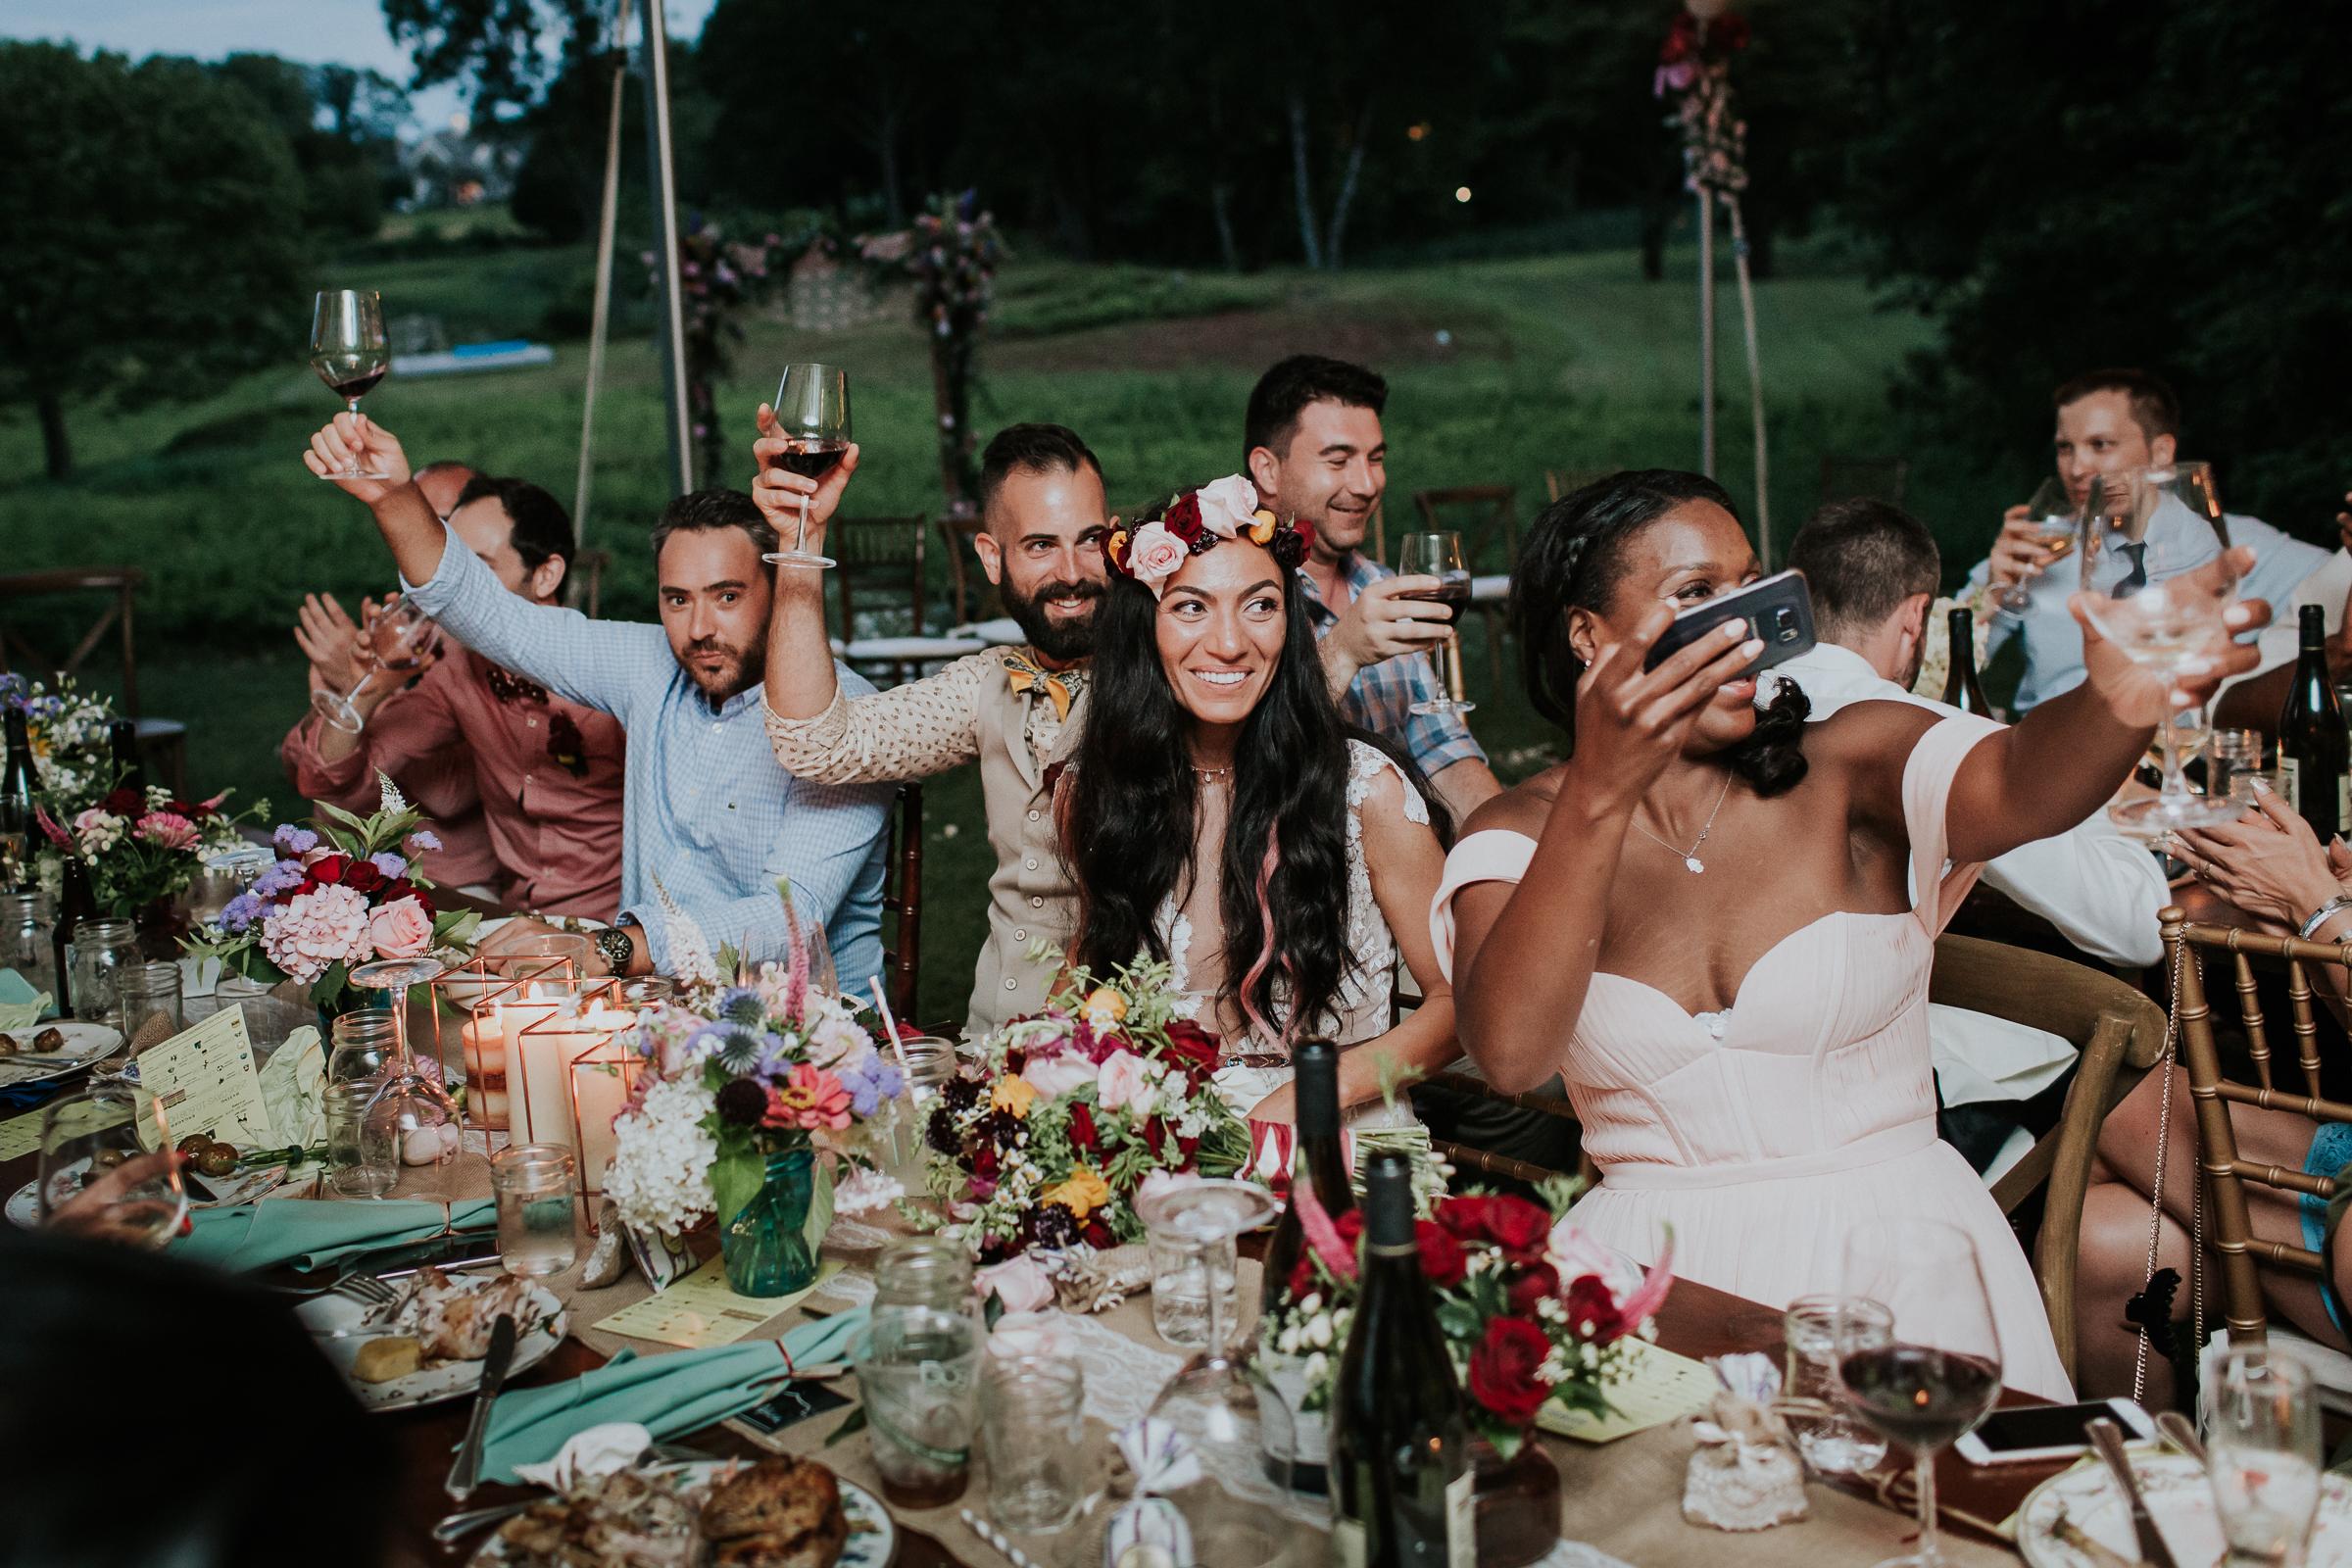 Backyard-Intimate-Adventurous-Destination-Wedding-Darien-Connecticut-Documentary-Wedding-Photography-117.jpg